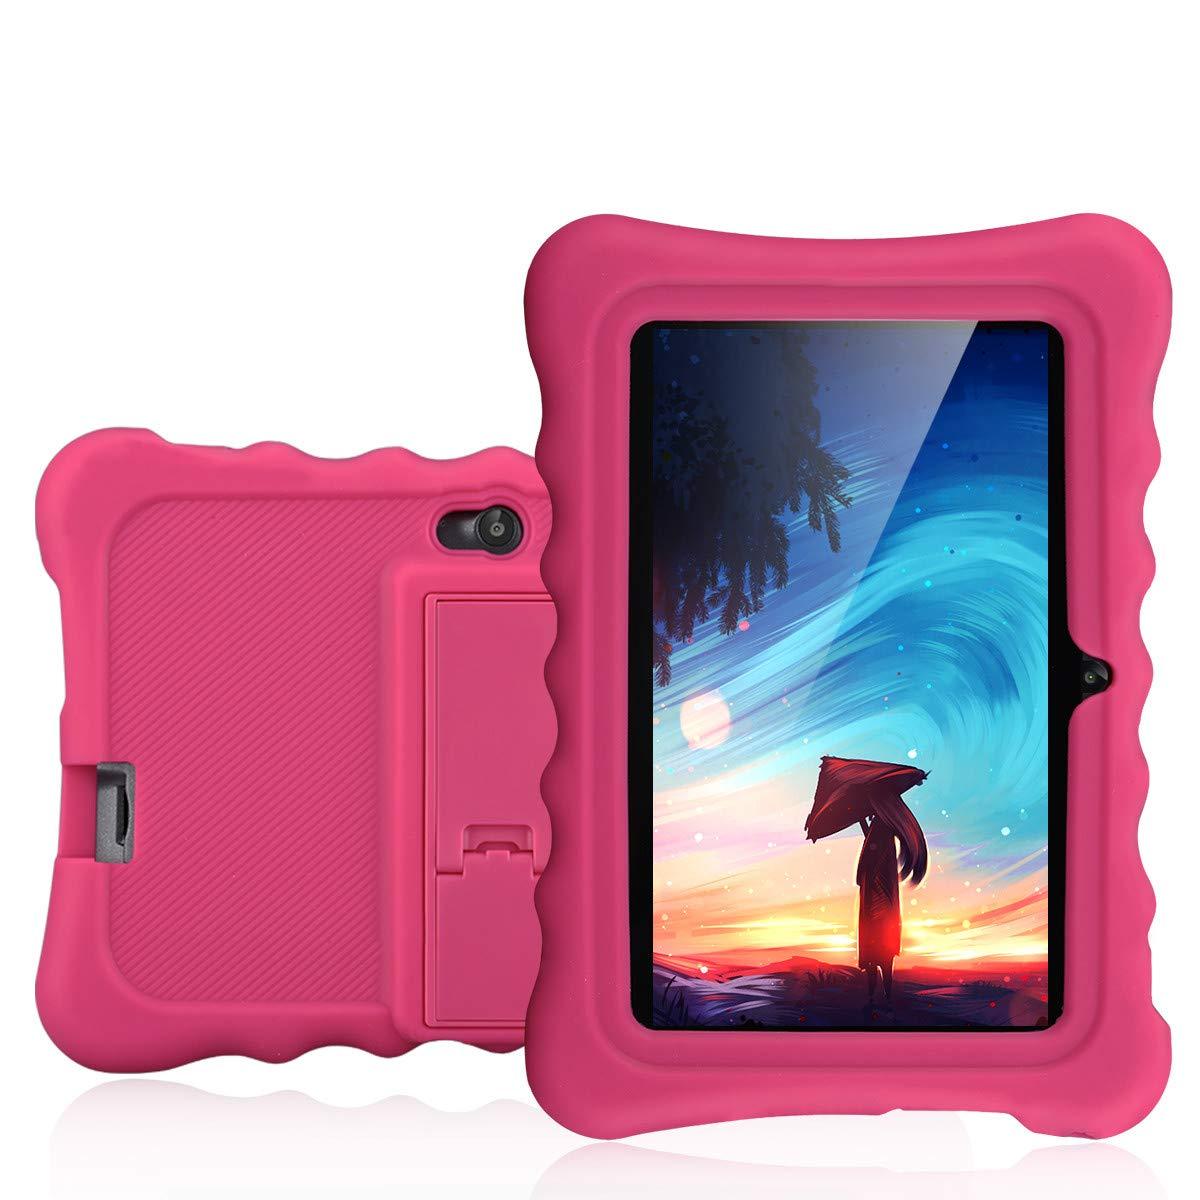 Ainol Q88 Android 7.1 RK3126C Quad Core 1GB+16GB 0.3MP+0.3MP Cam WiFi 2800Ah Tablet PC--Pink by Ainol Q88 (Image #4)